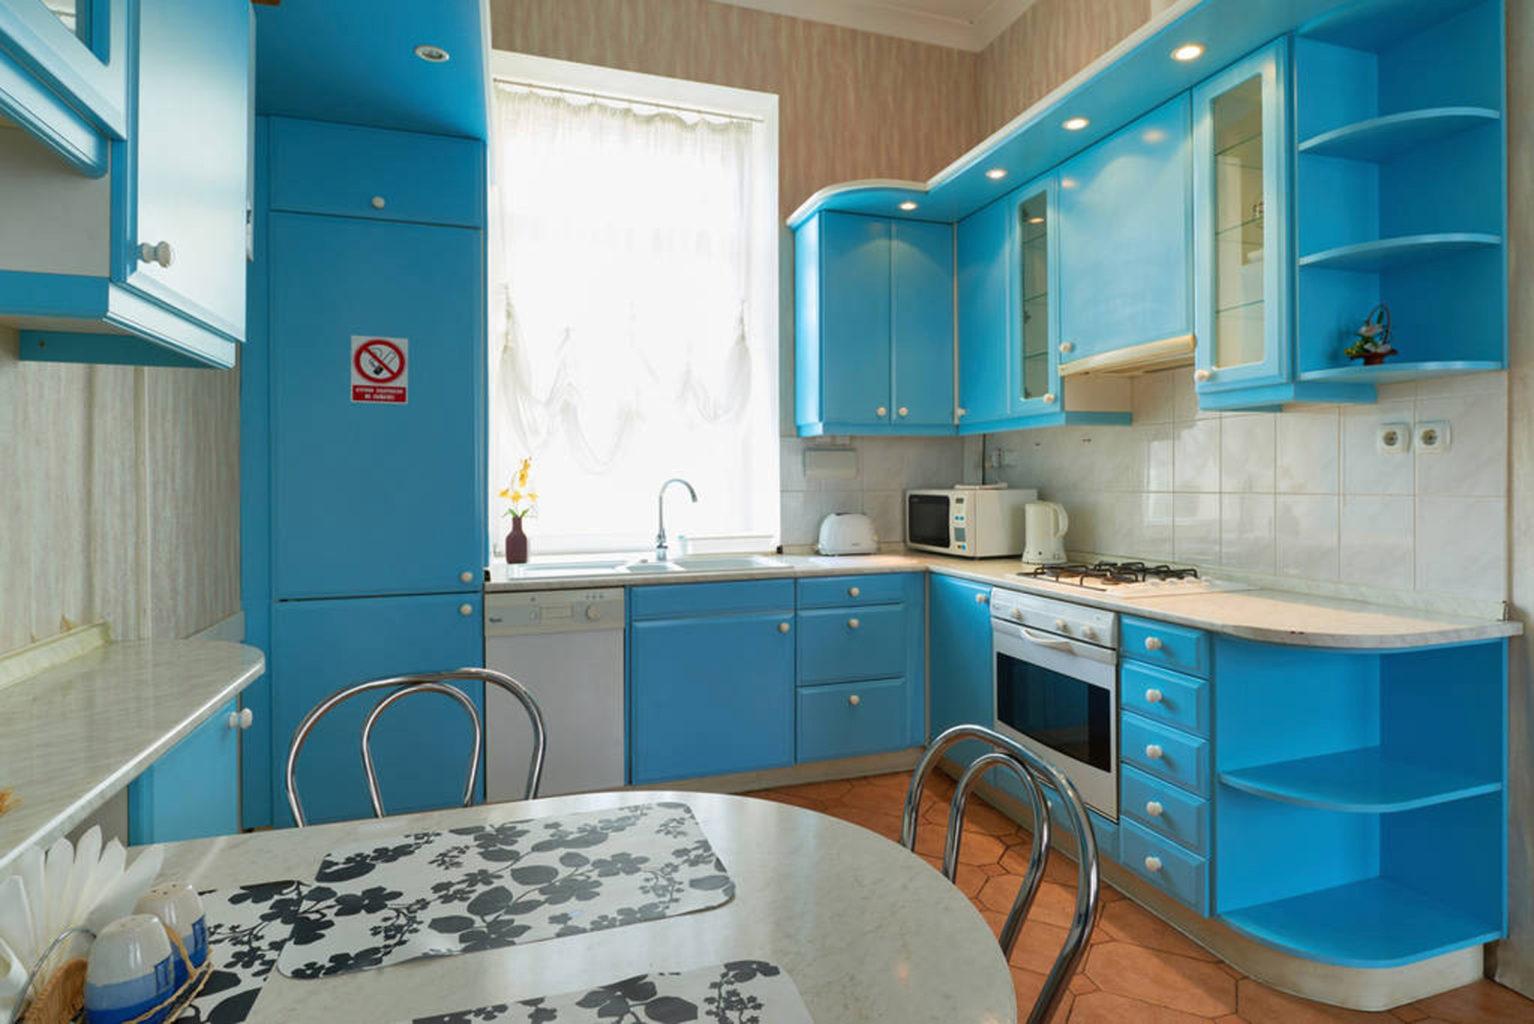 One-bedroom apartment for daily rent in Kiev, Bogdan Khmelnitsky 29 2